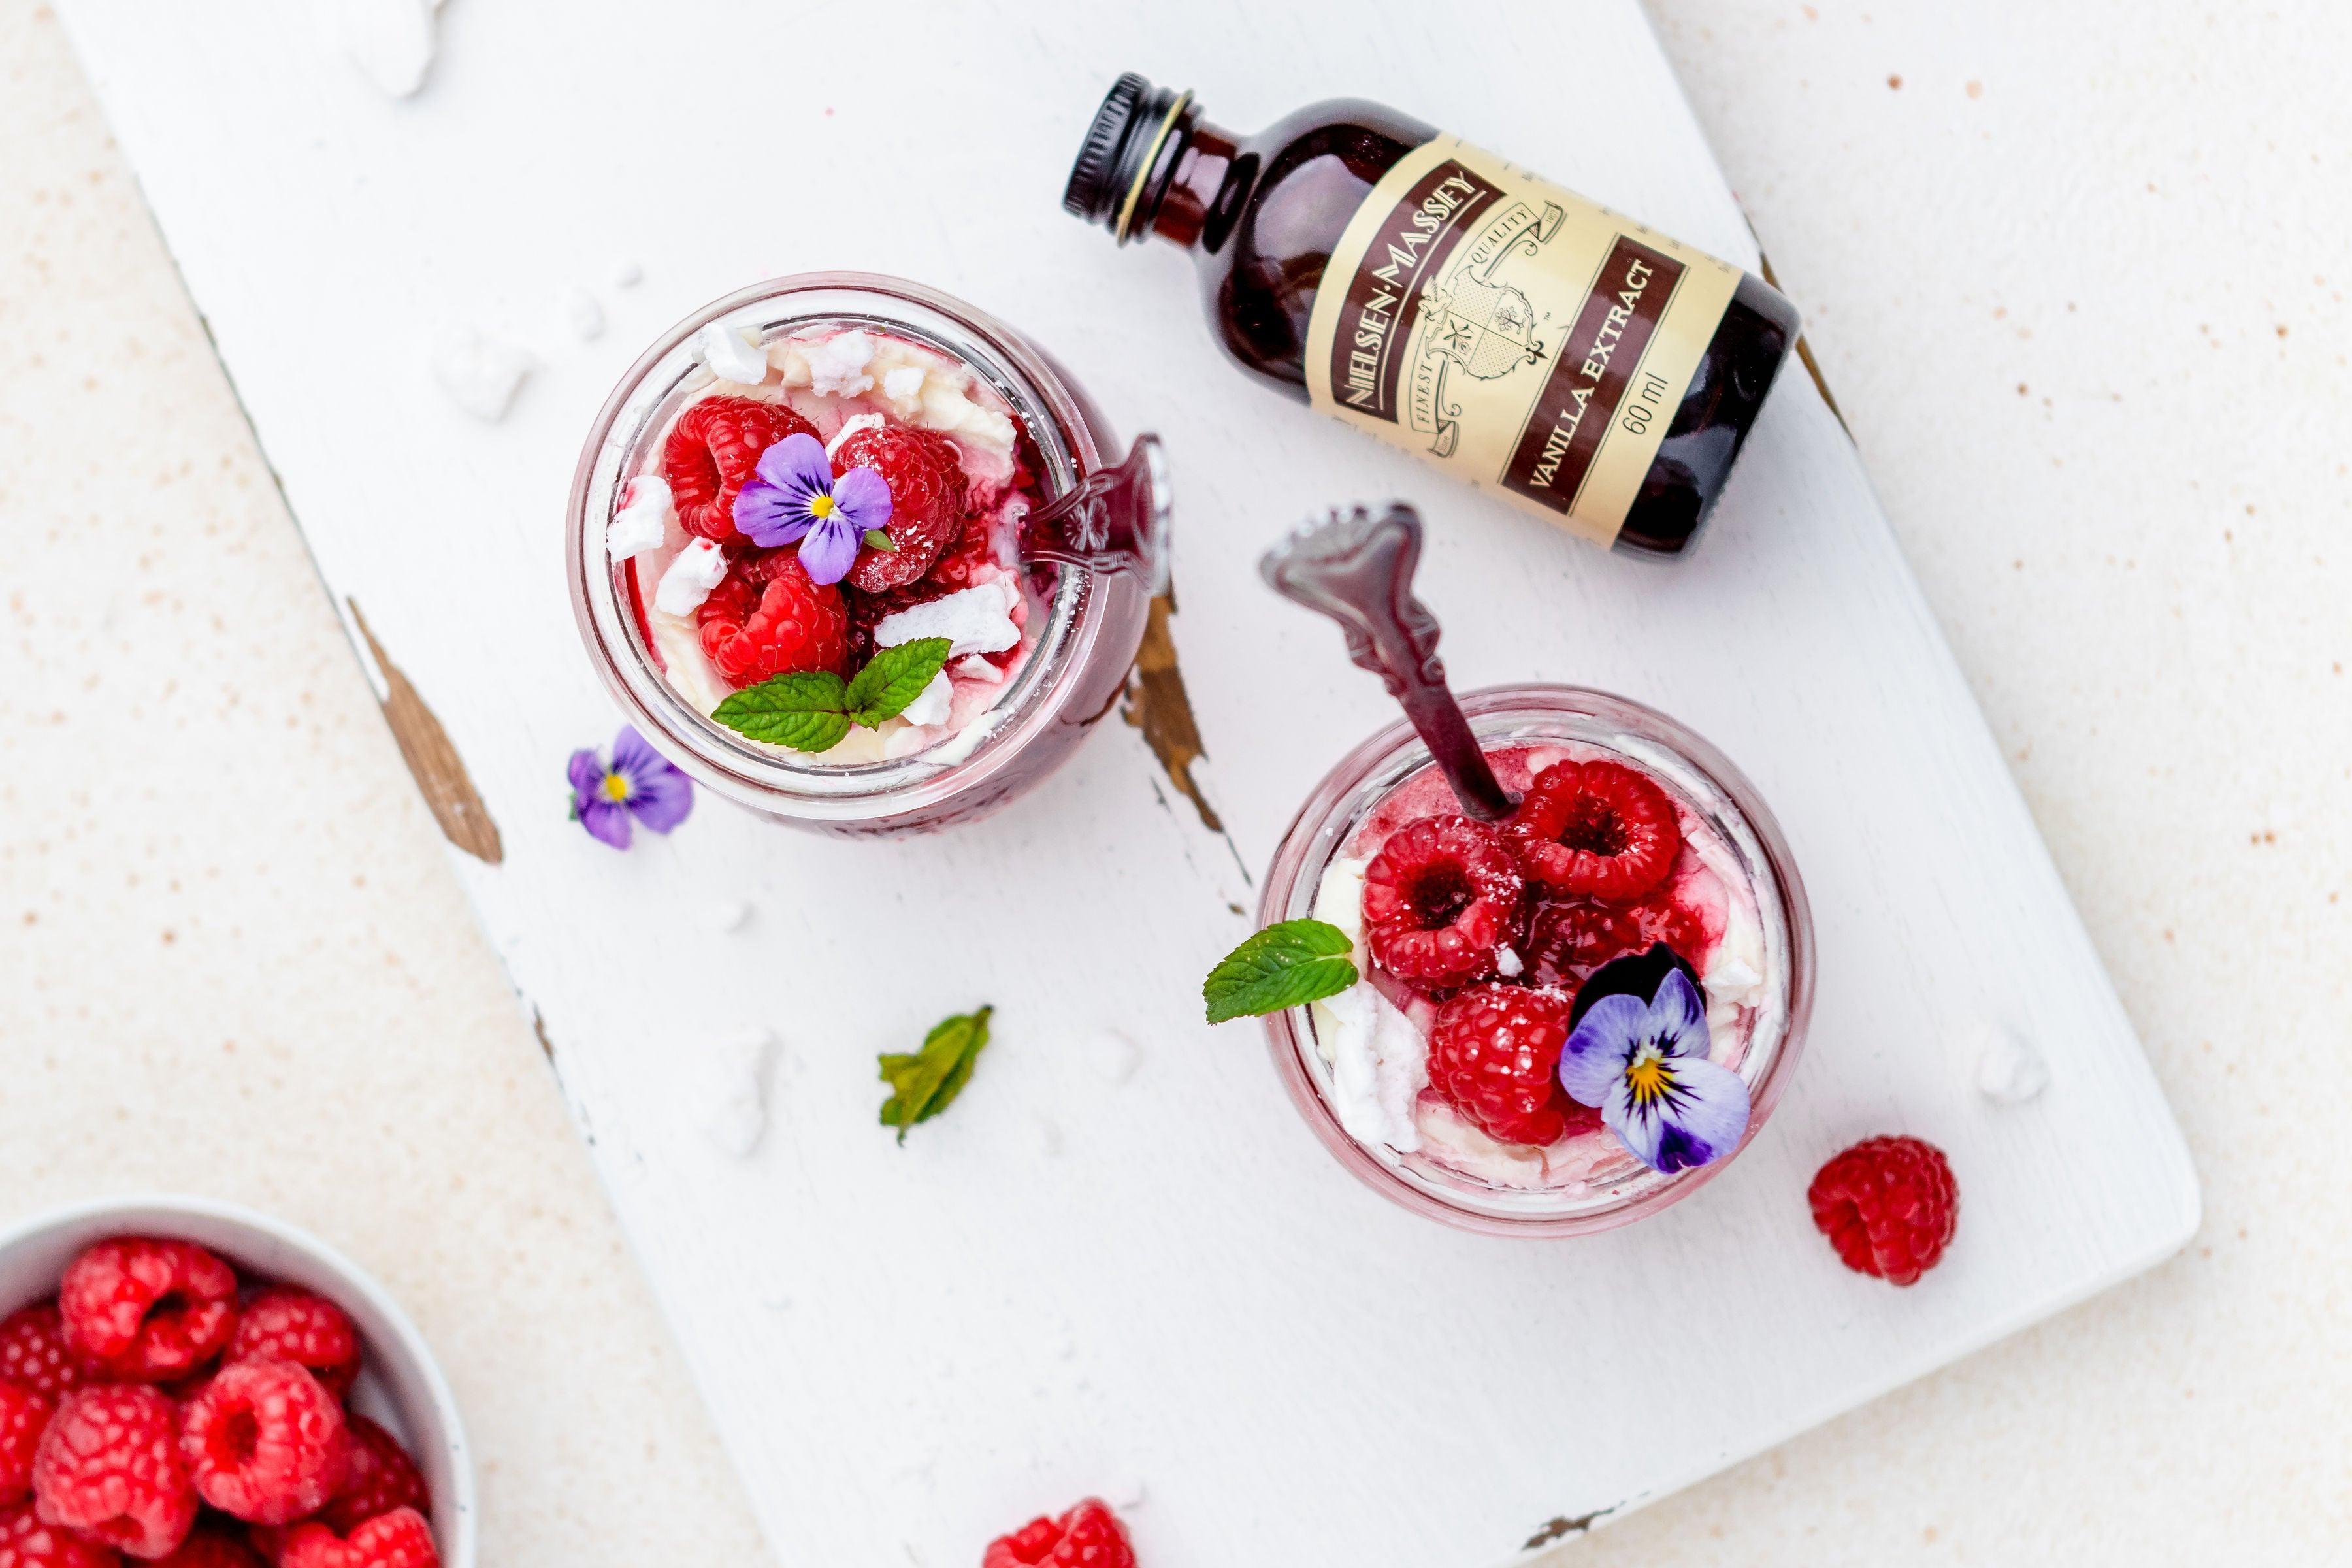 Overhead shot of 2 bowls of eton mess, raspberries, edible flowers and vanilla extract